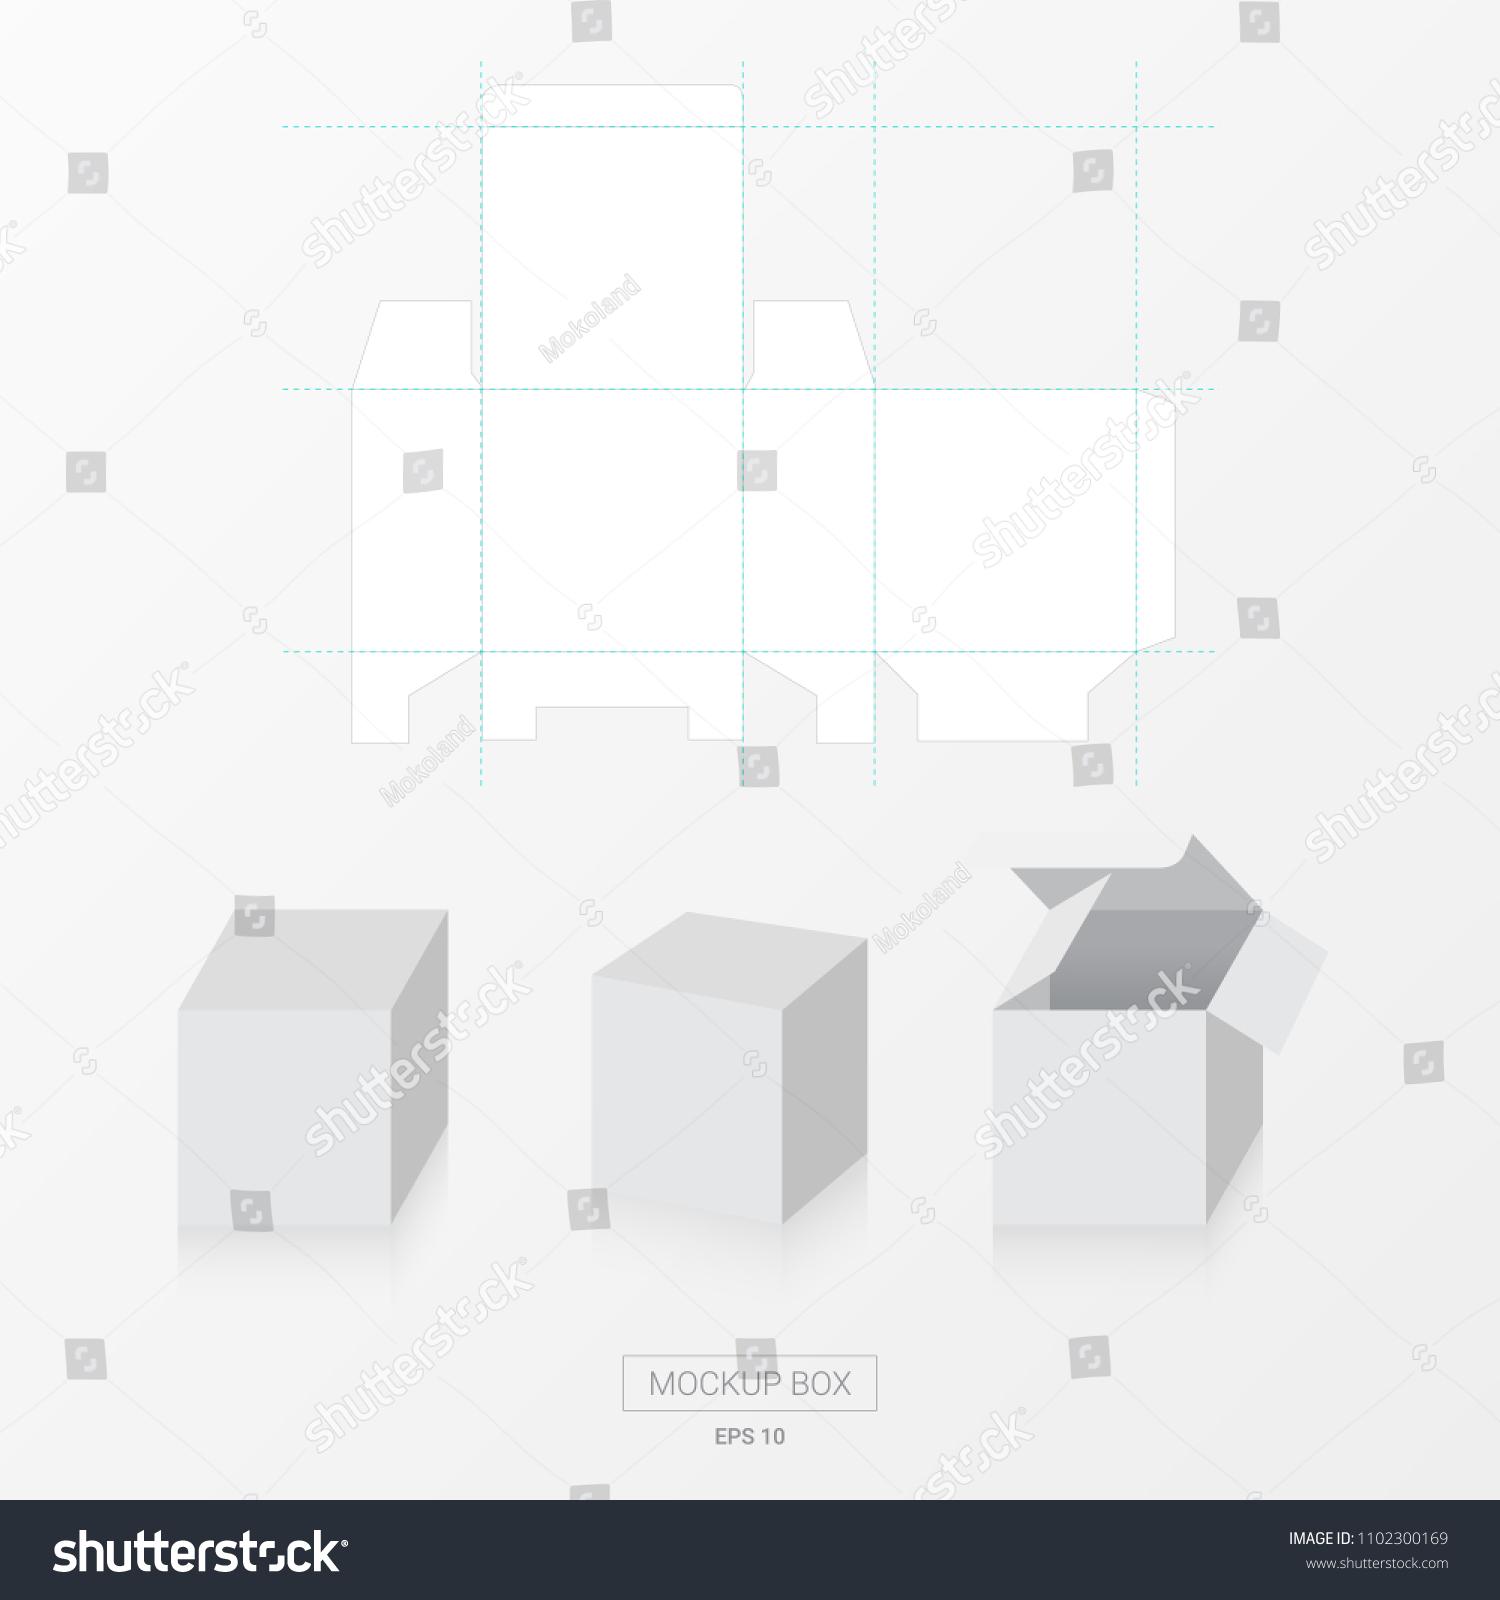 mockup box die cut template vector stock vector royalty free